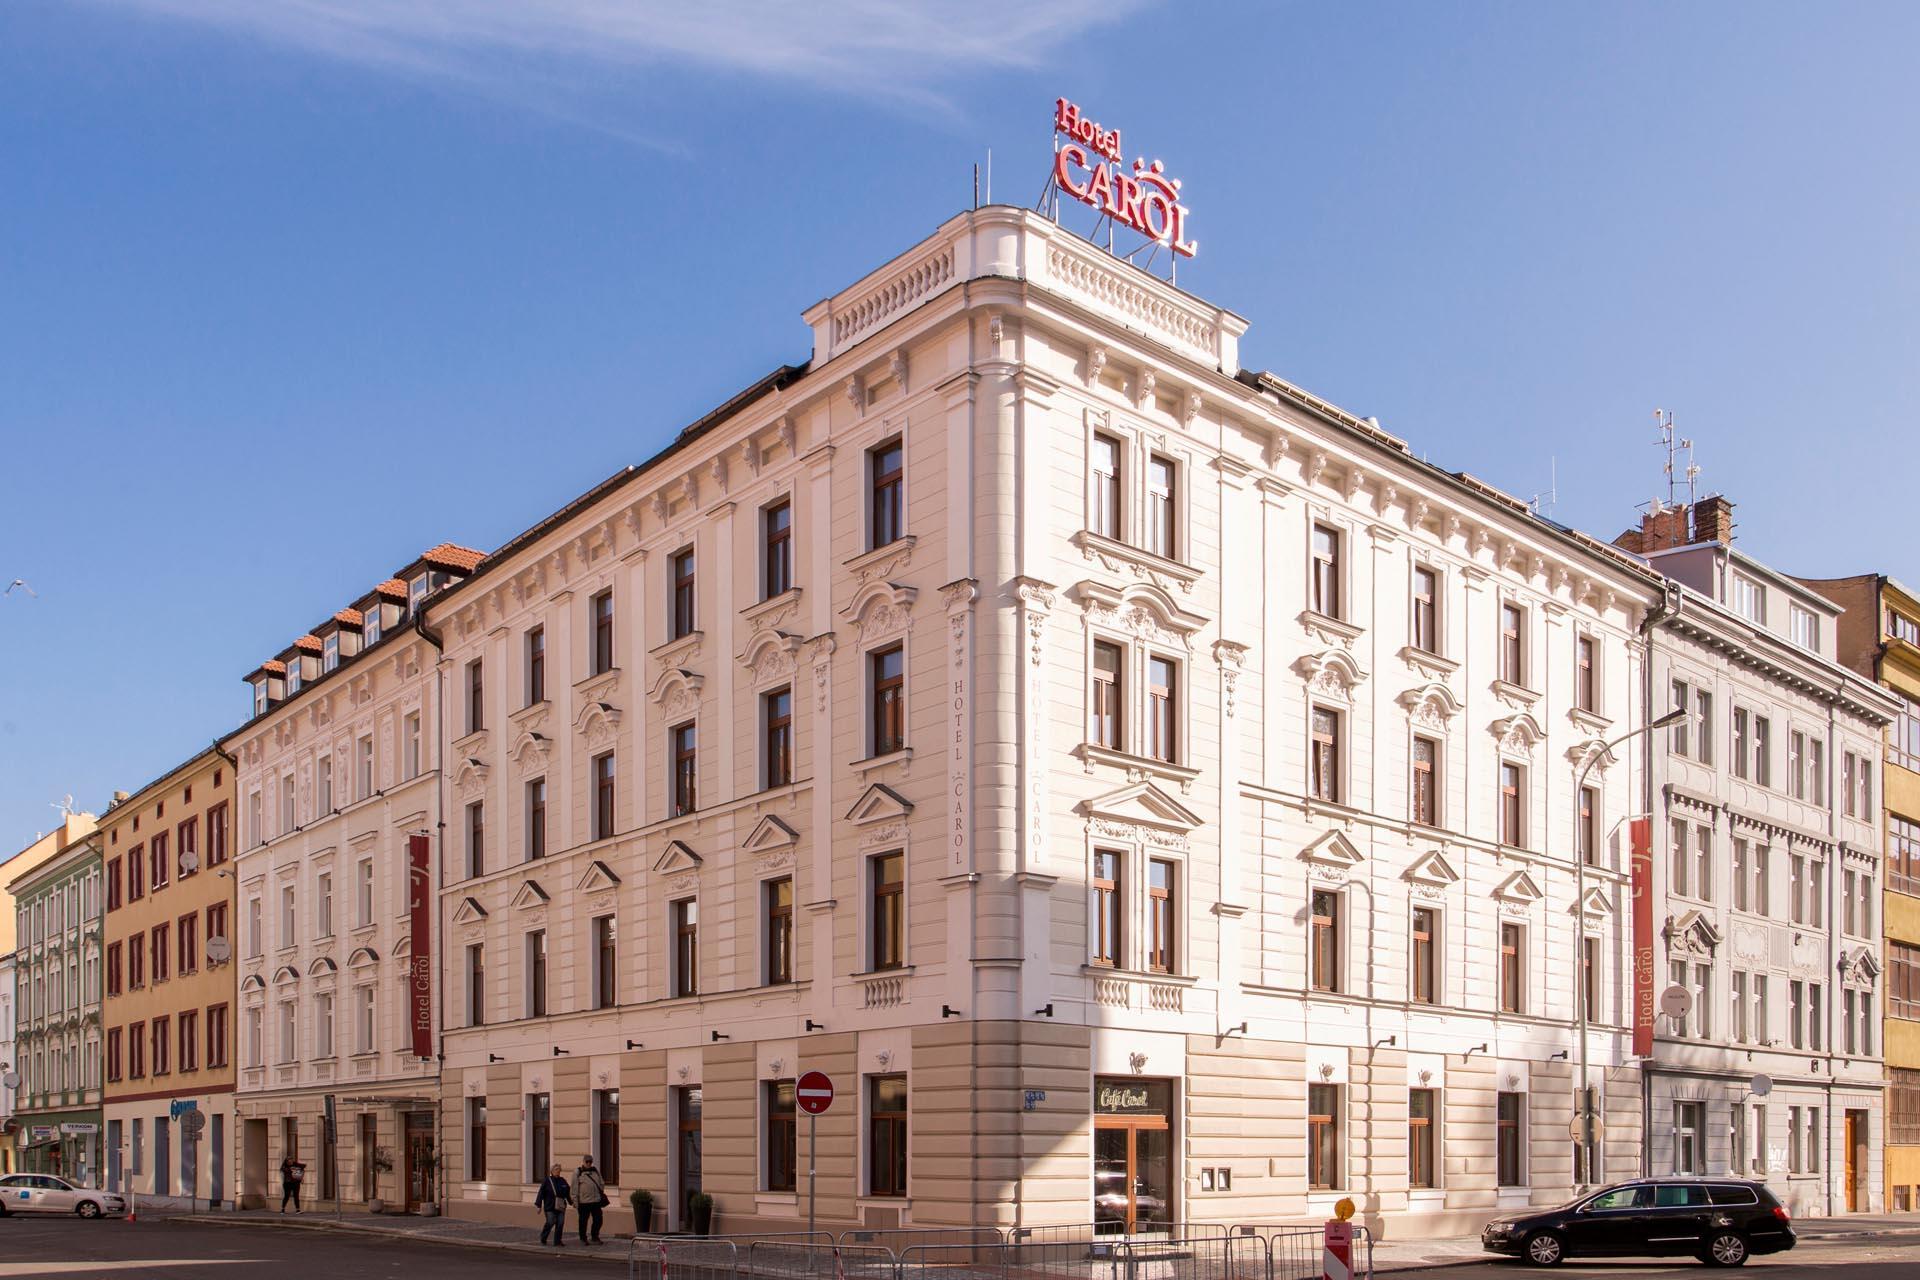 Hotel Carol in Prague